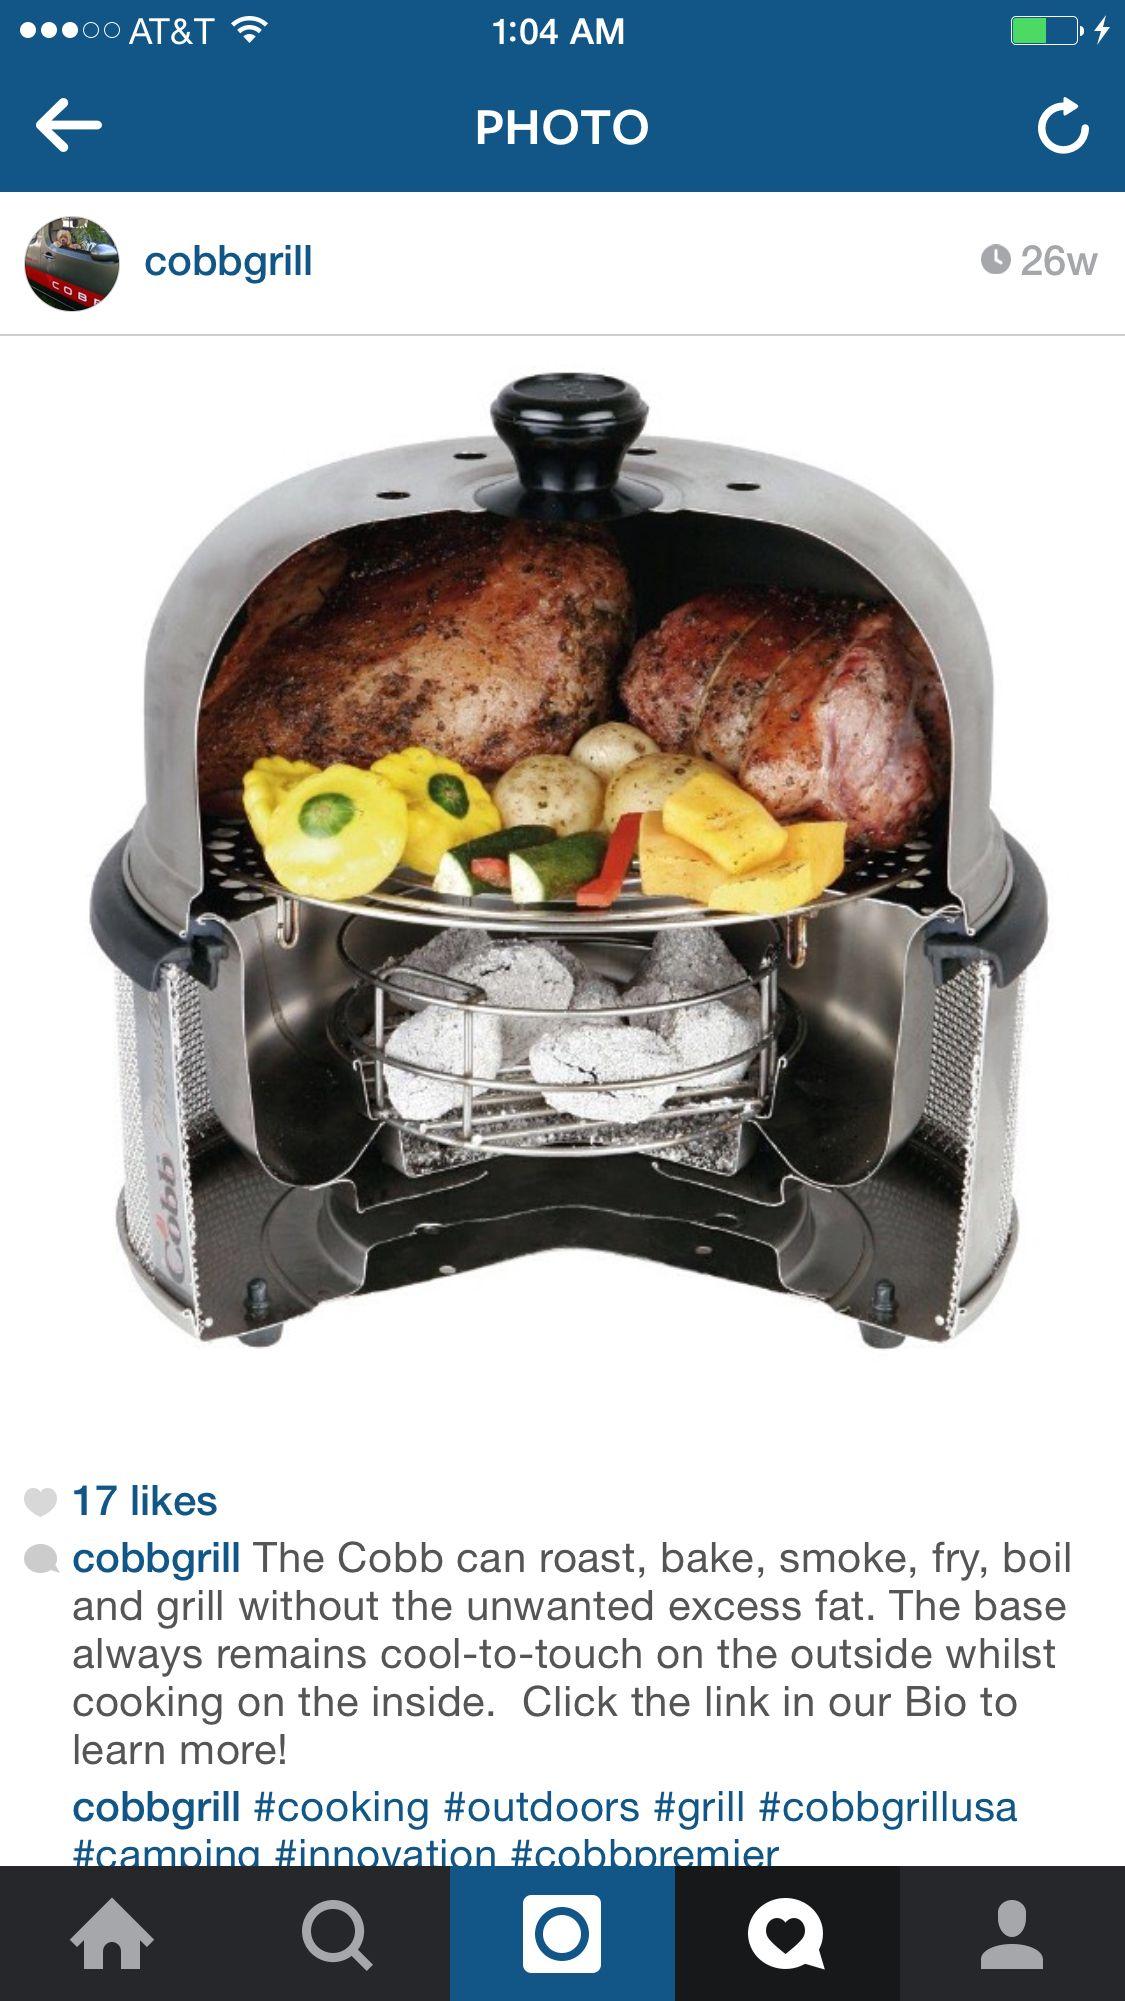 cobb premier | cobb recepten | pinterest | outdoor cooking and grilling